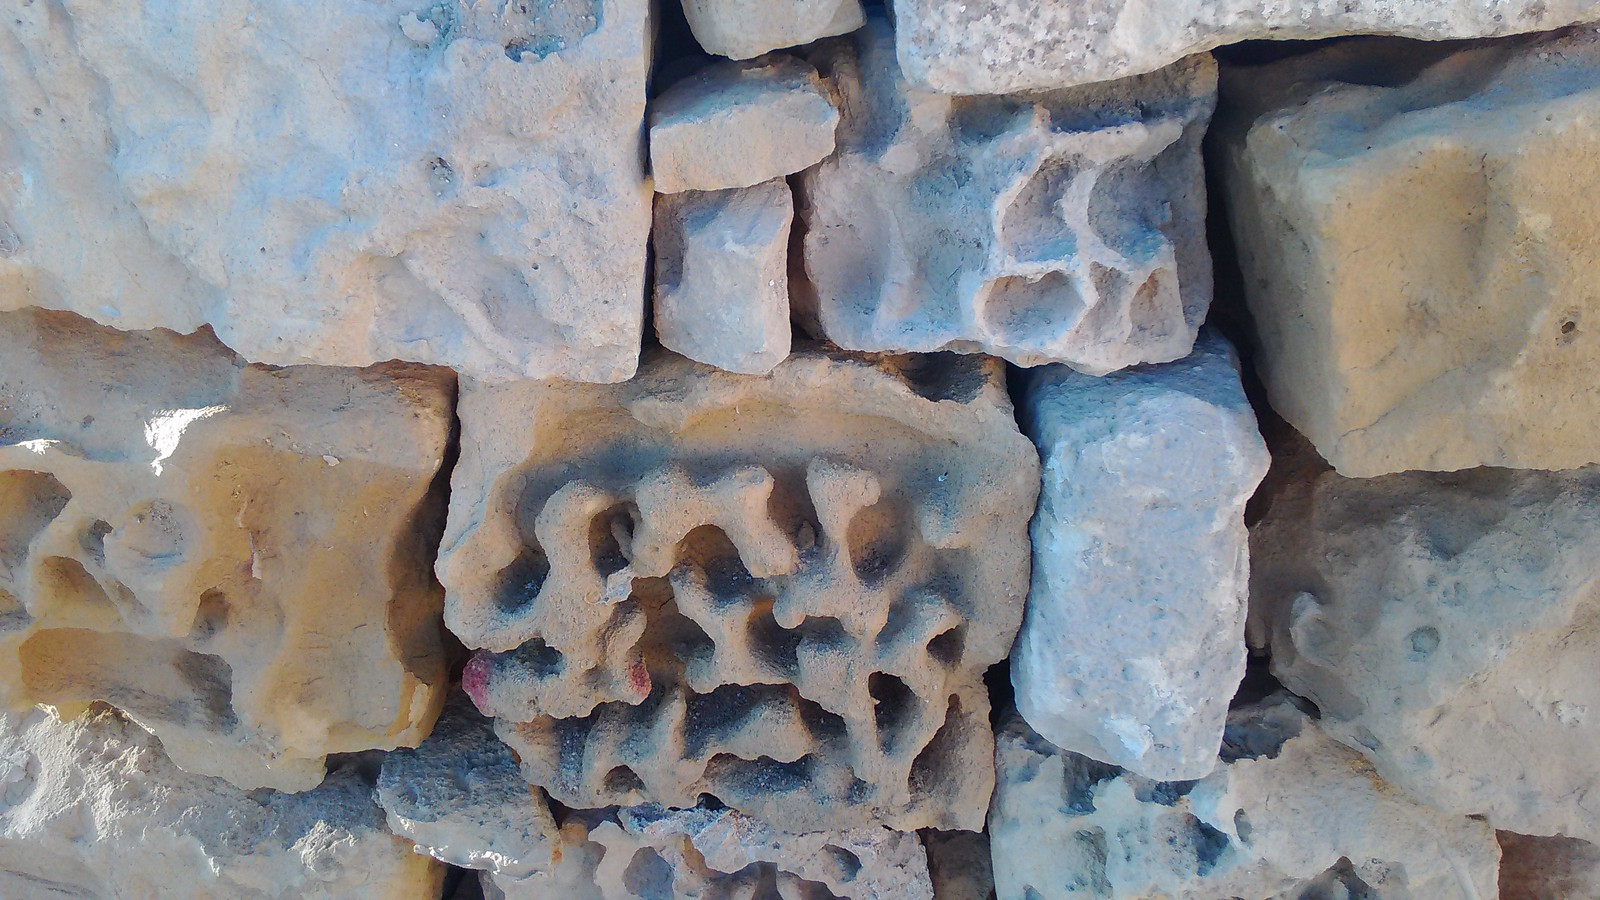 Pietra locale calcarea color miele